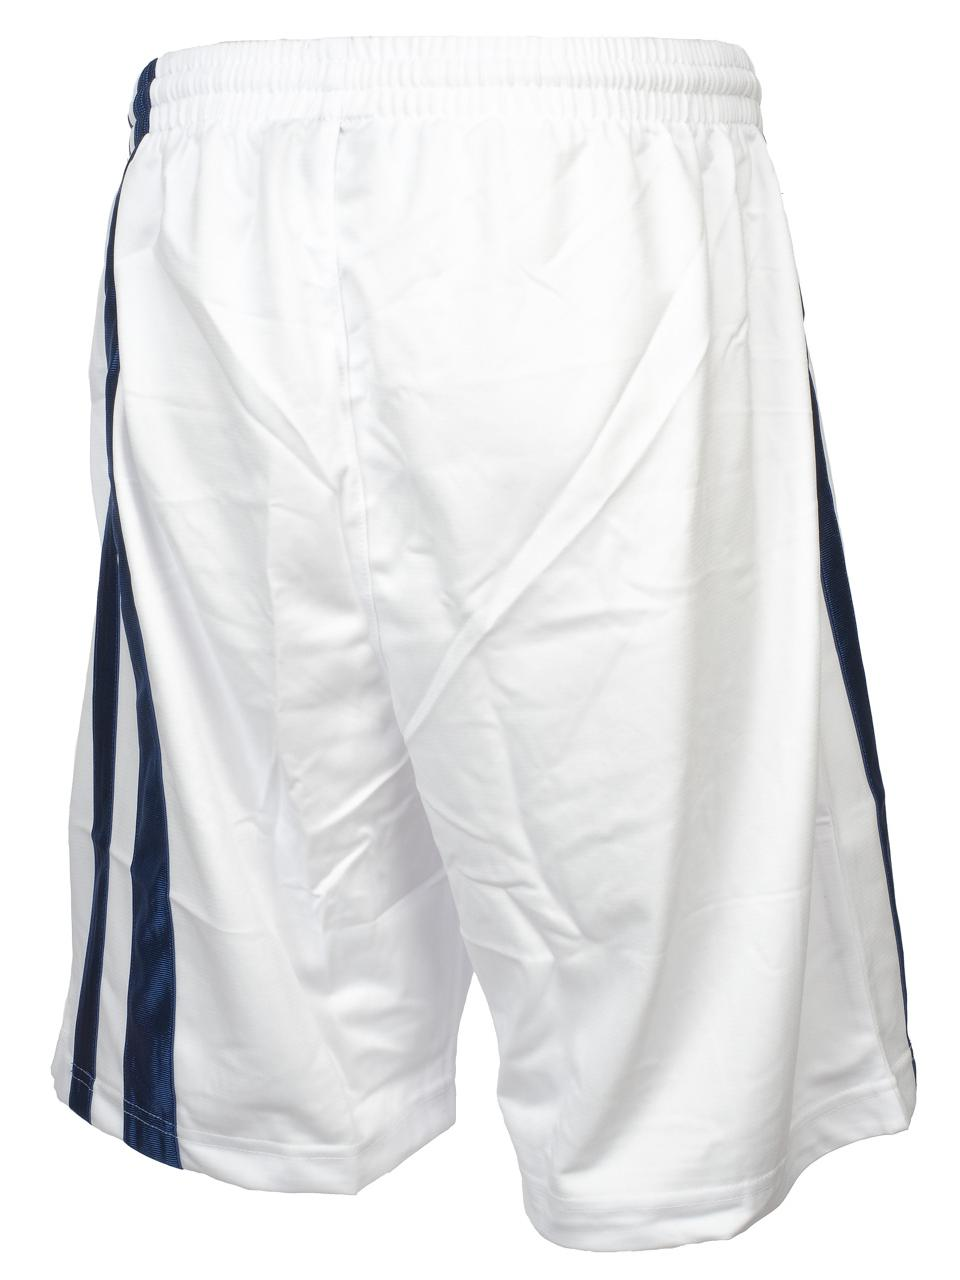 Short-de-basket-Spalding-Mvp-blanc-bleu-short-Blanc-77853-Neuf